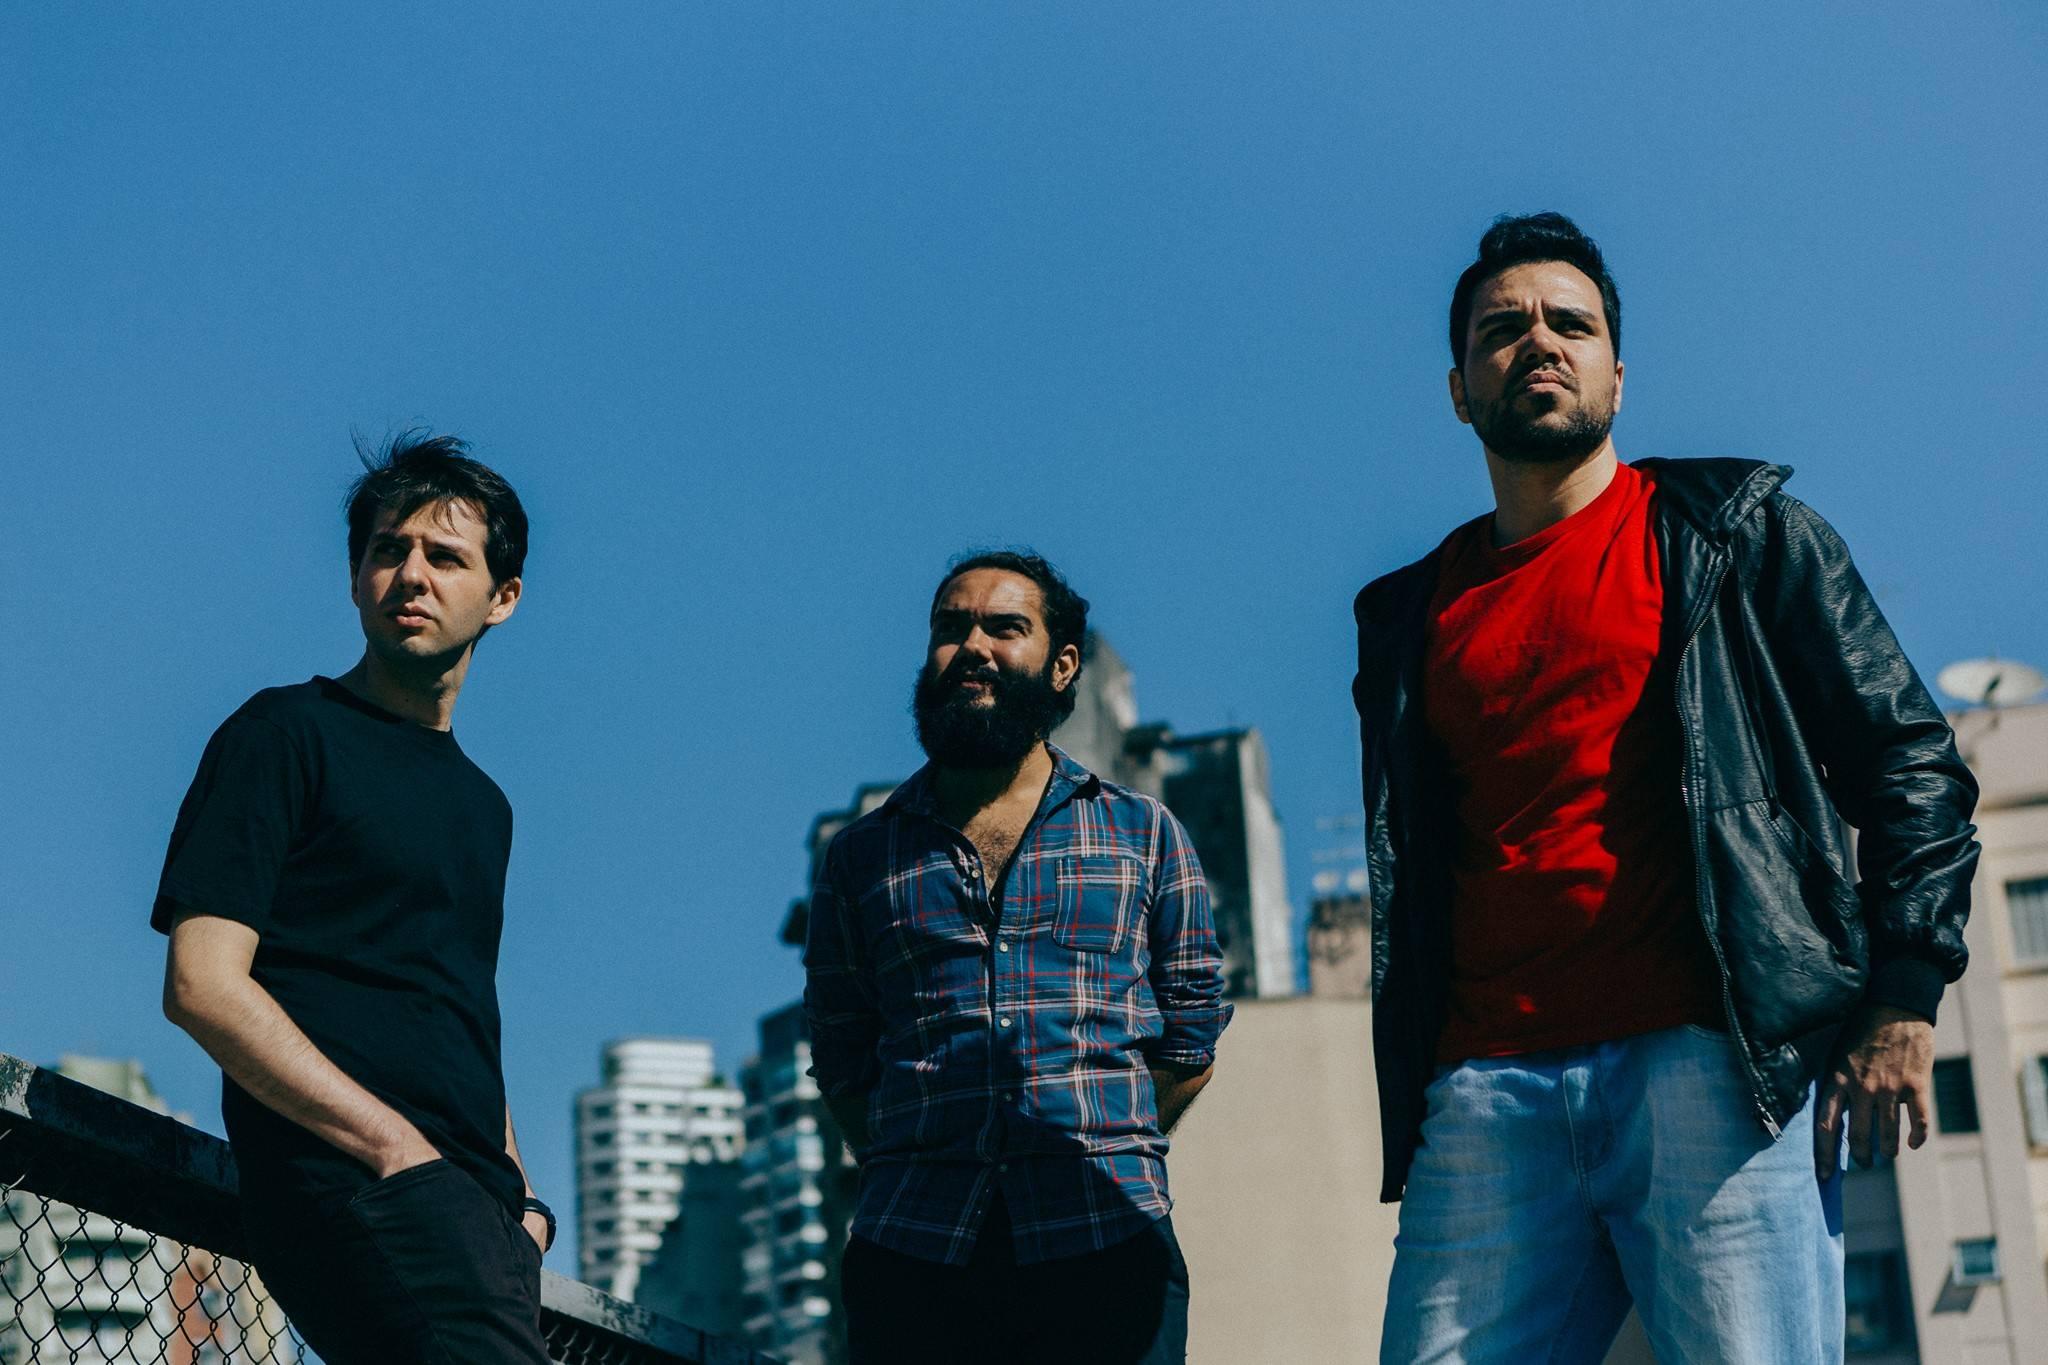 www.juicysantos.com.br - banda santista contradição arkana